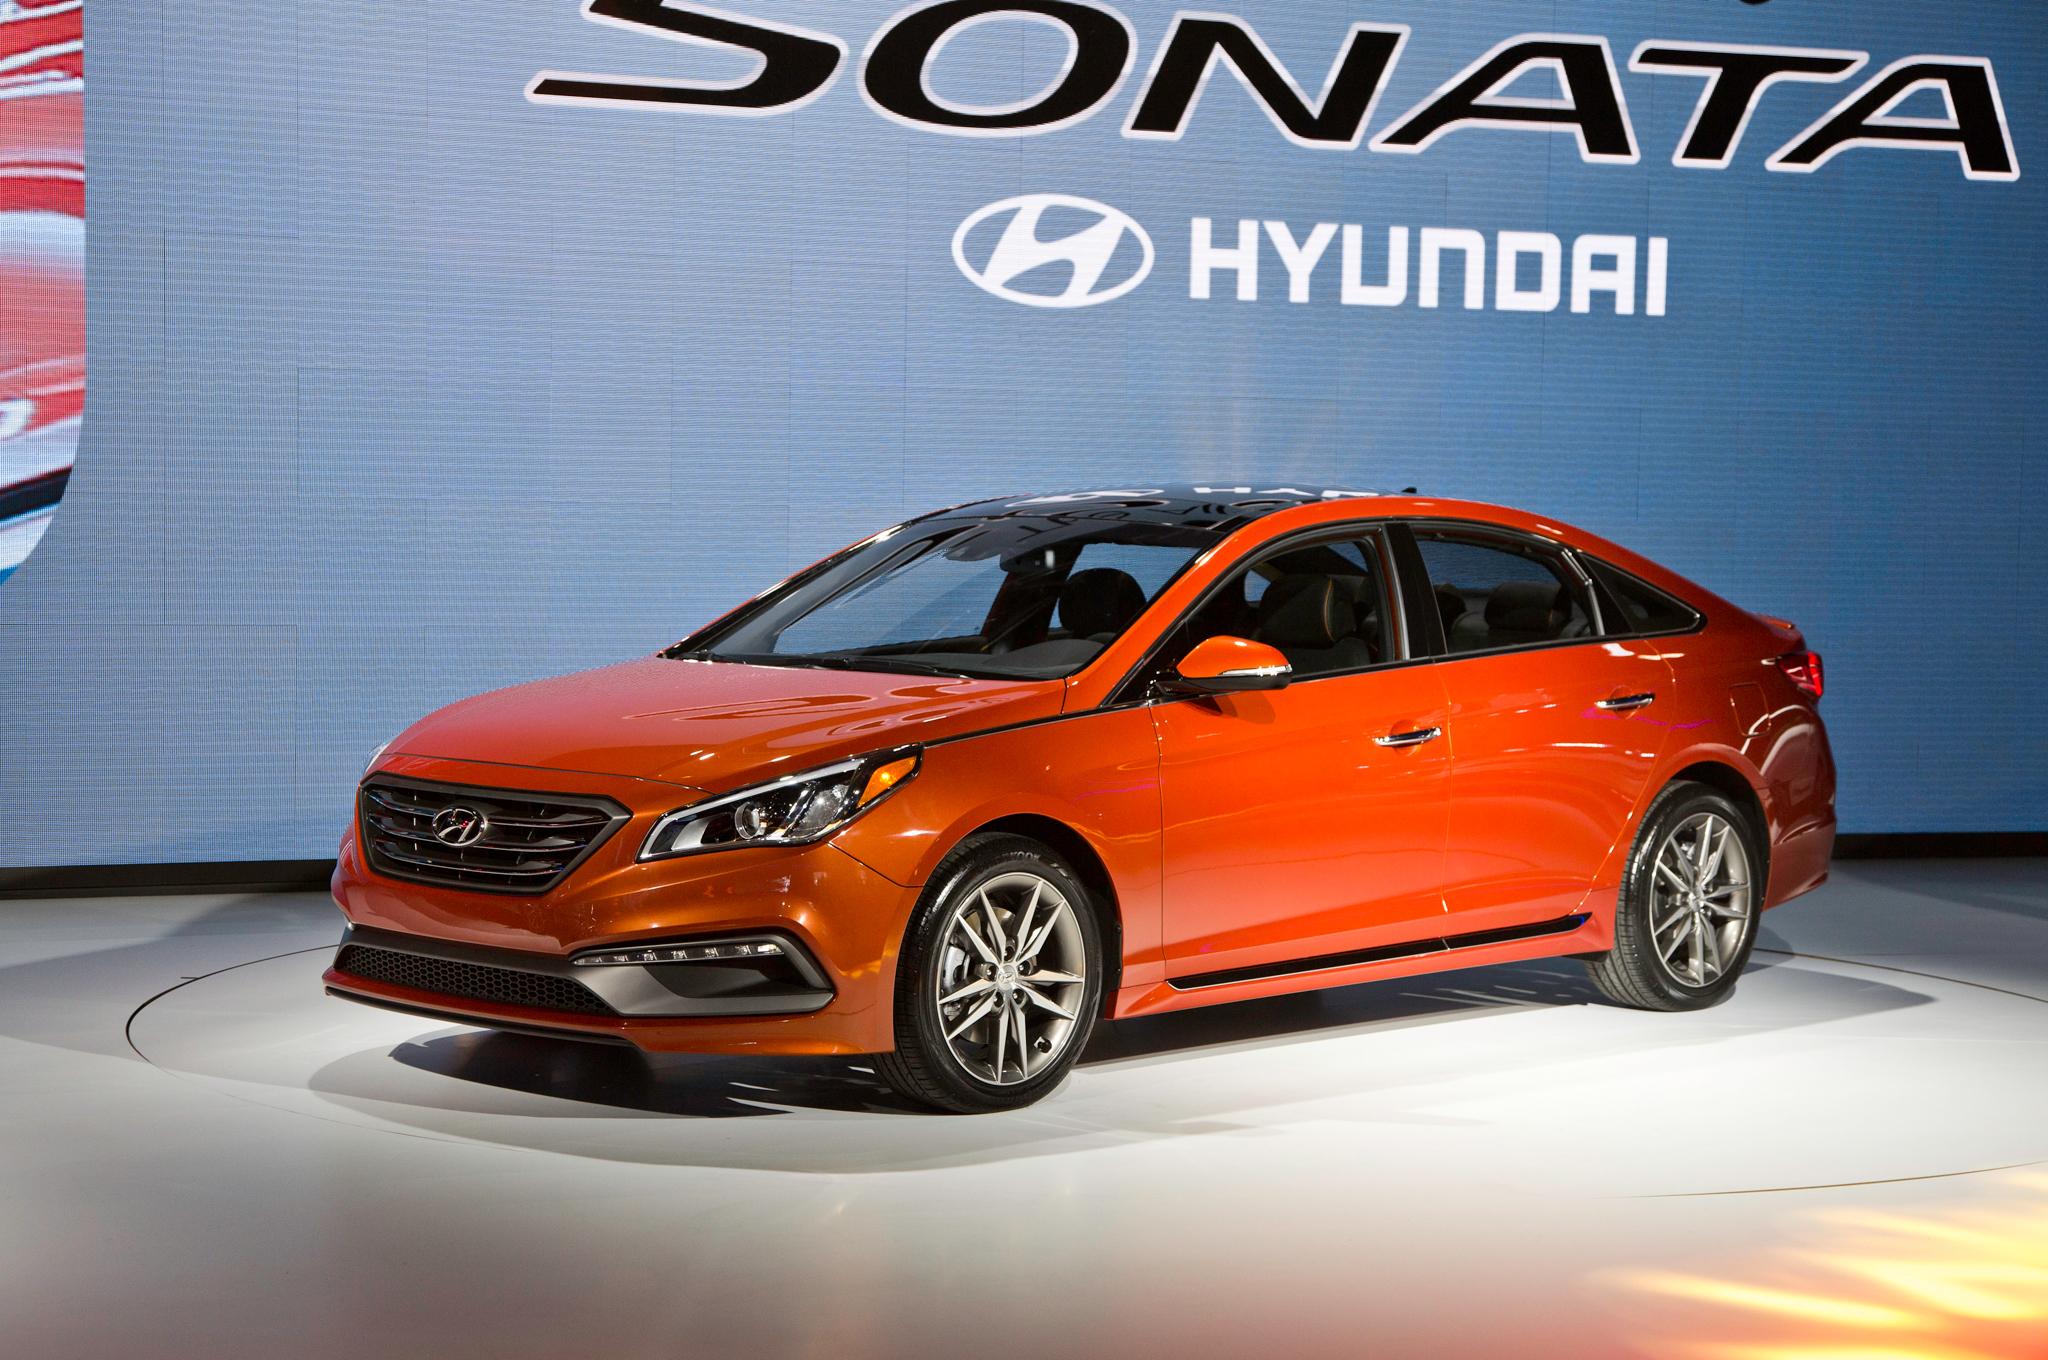 2015 Hyundai Sonata Auto Show